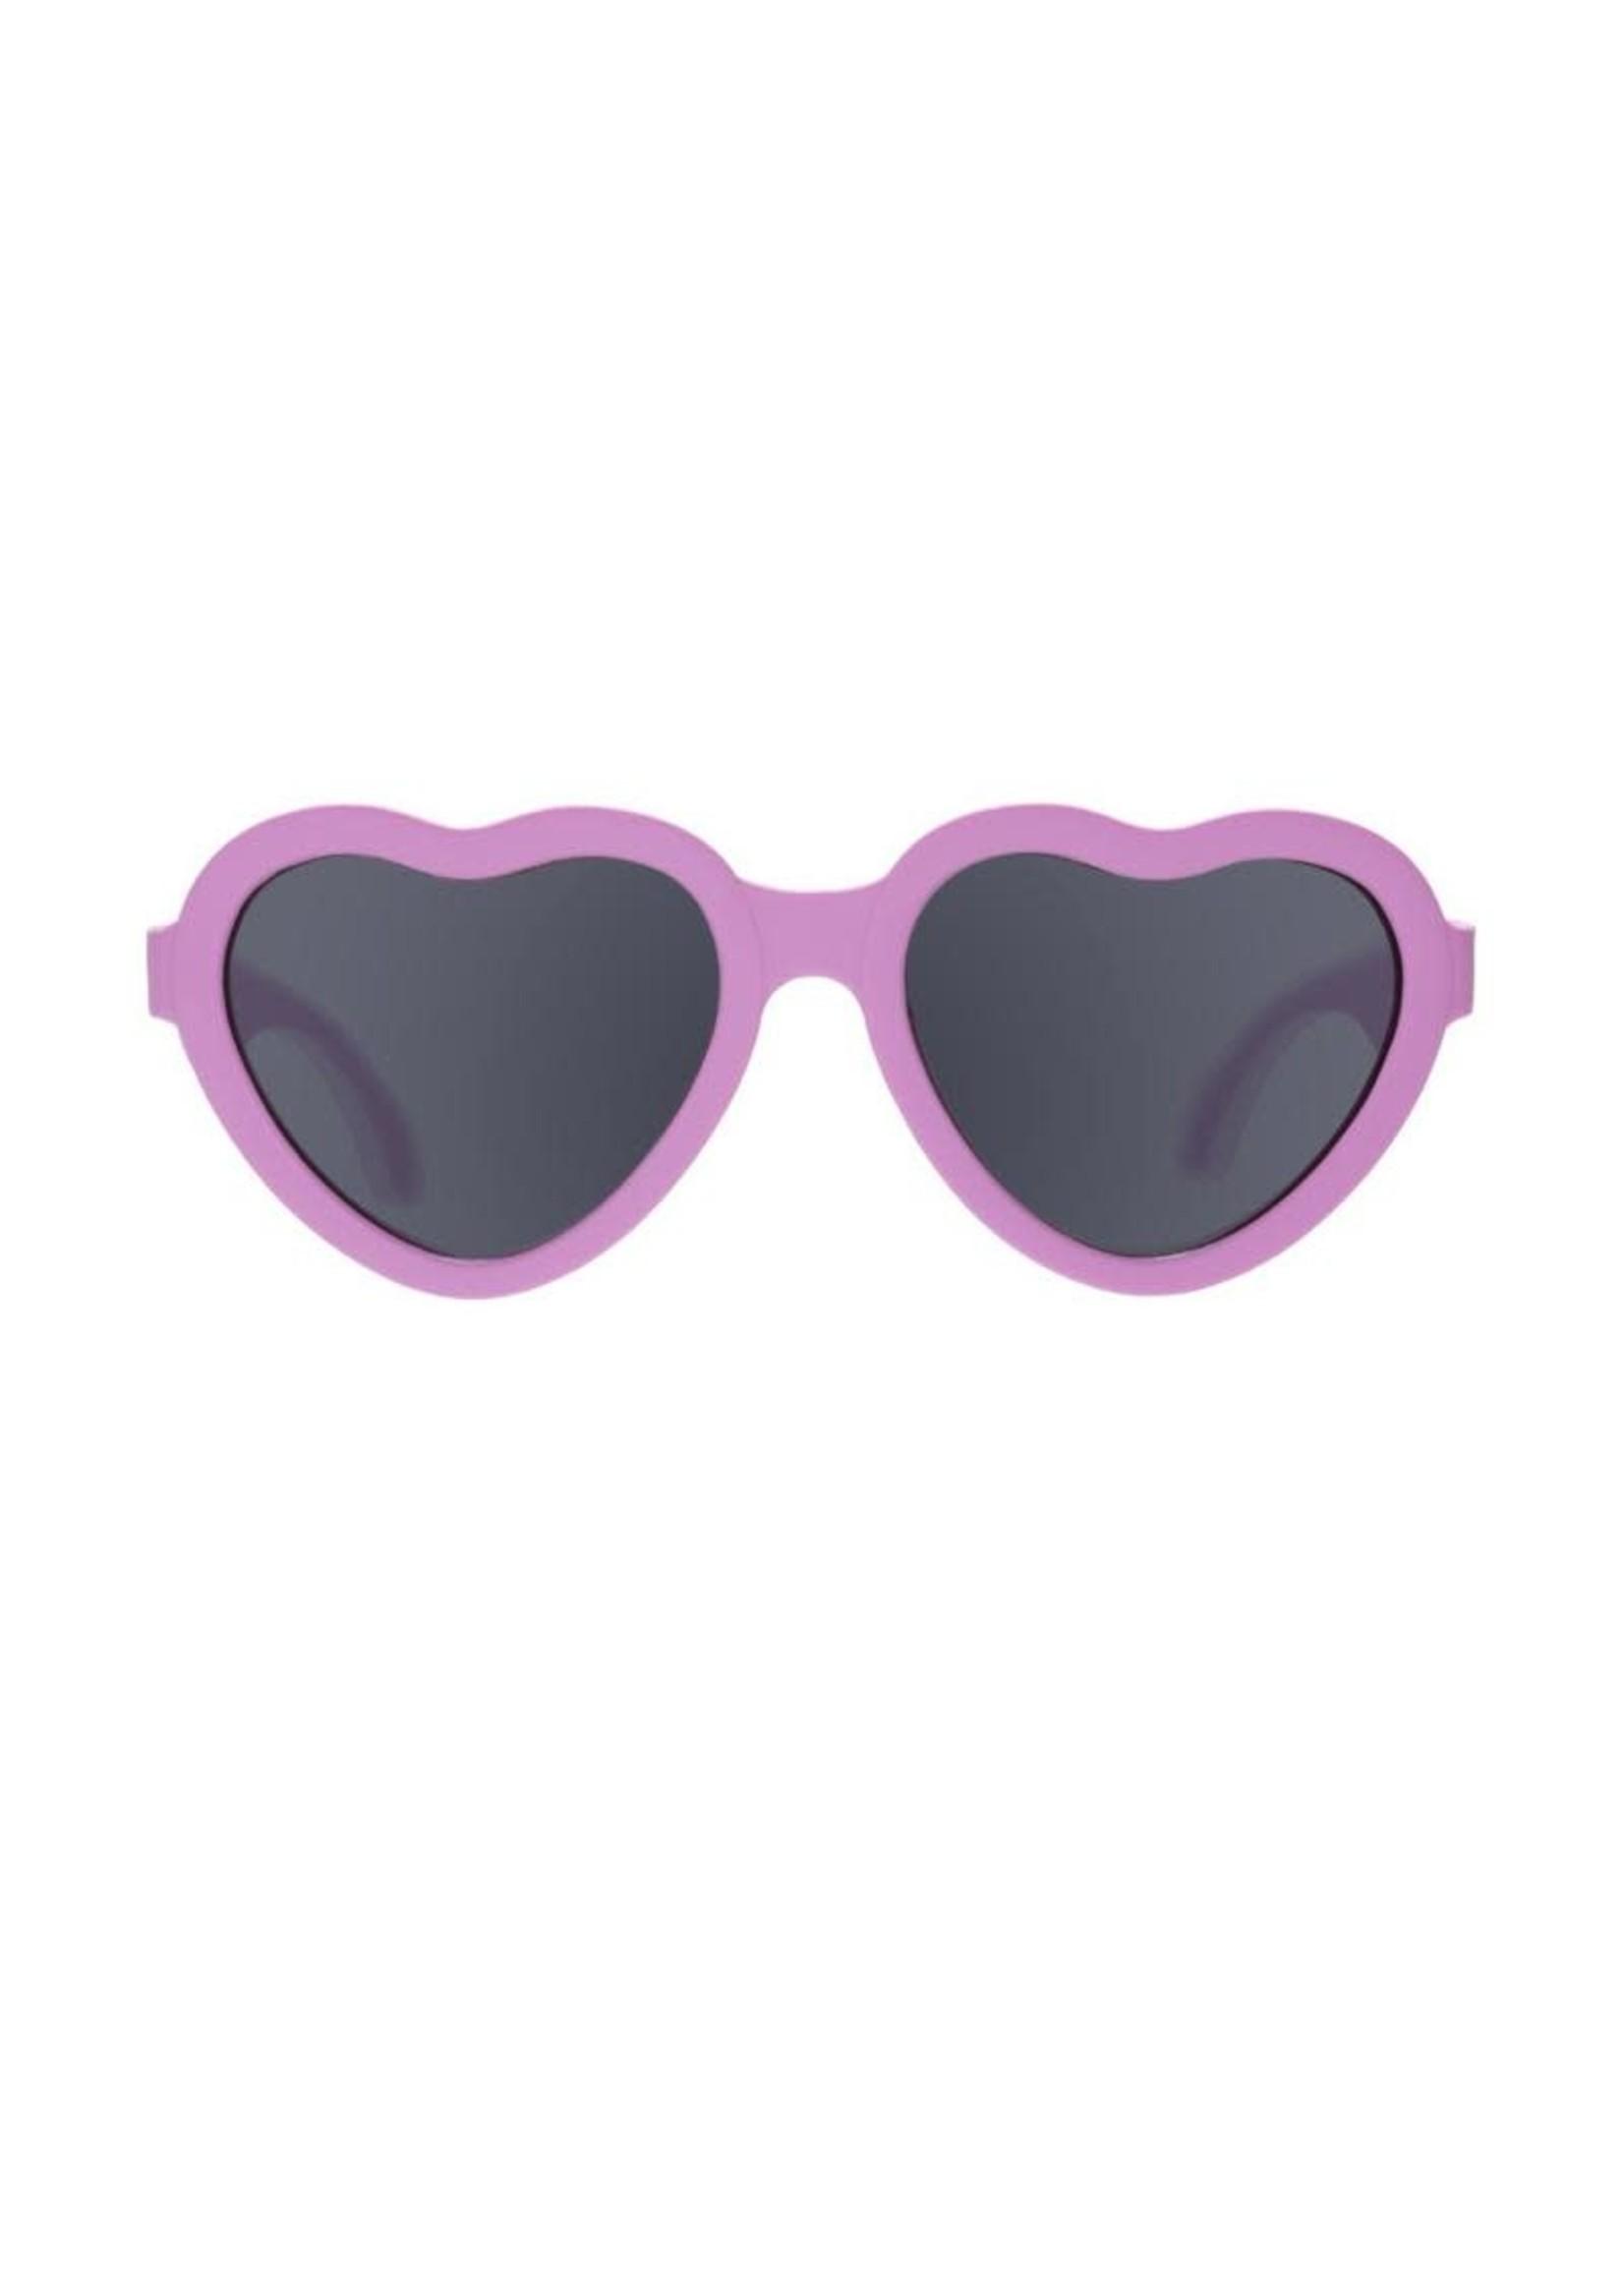 Babiators Babiators, Original Heart Ooh Lavender Sunglasses